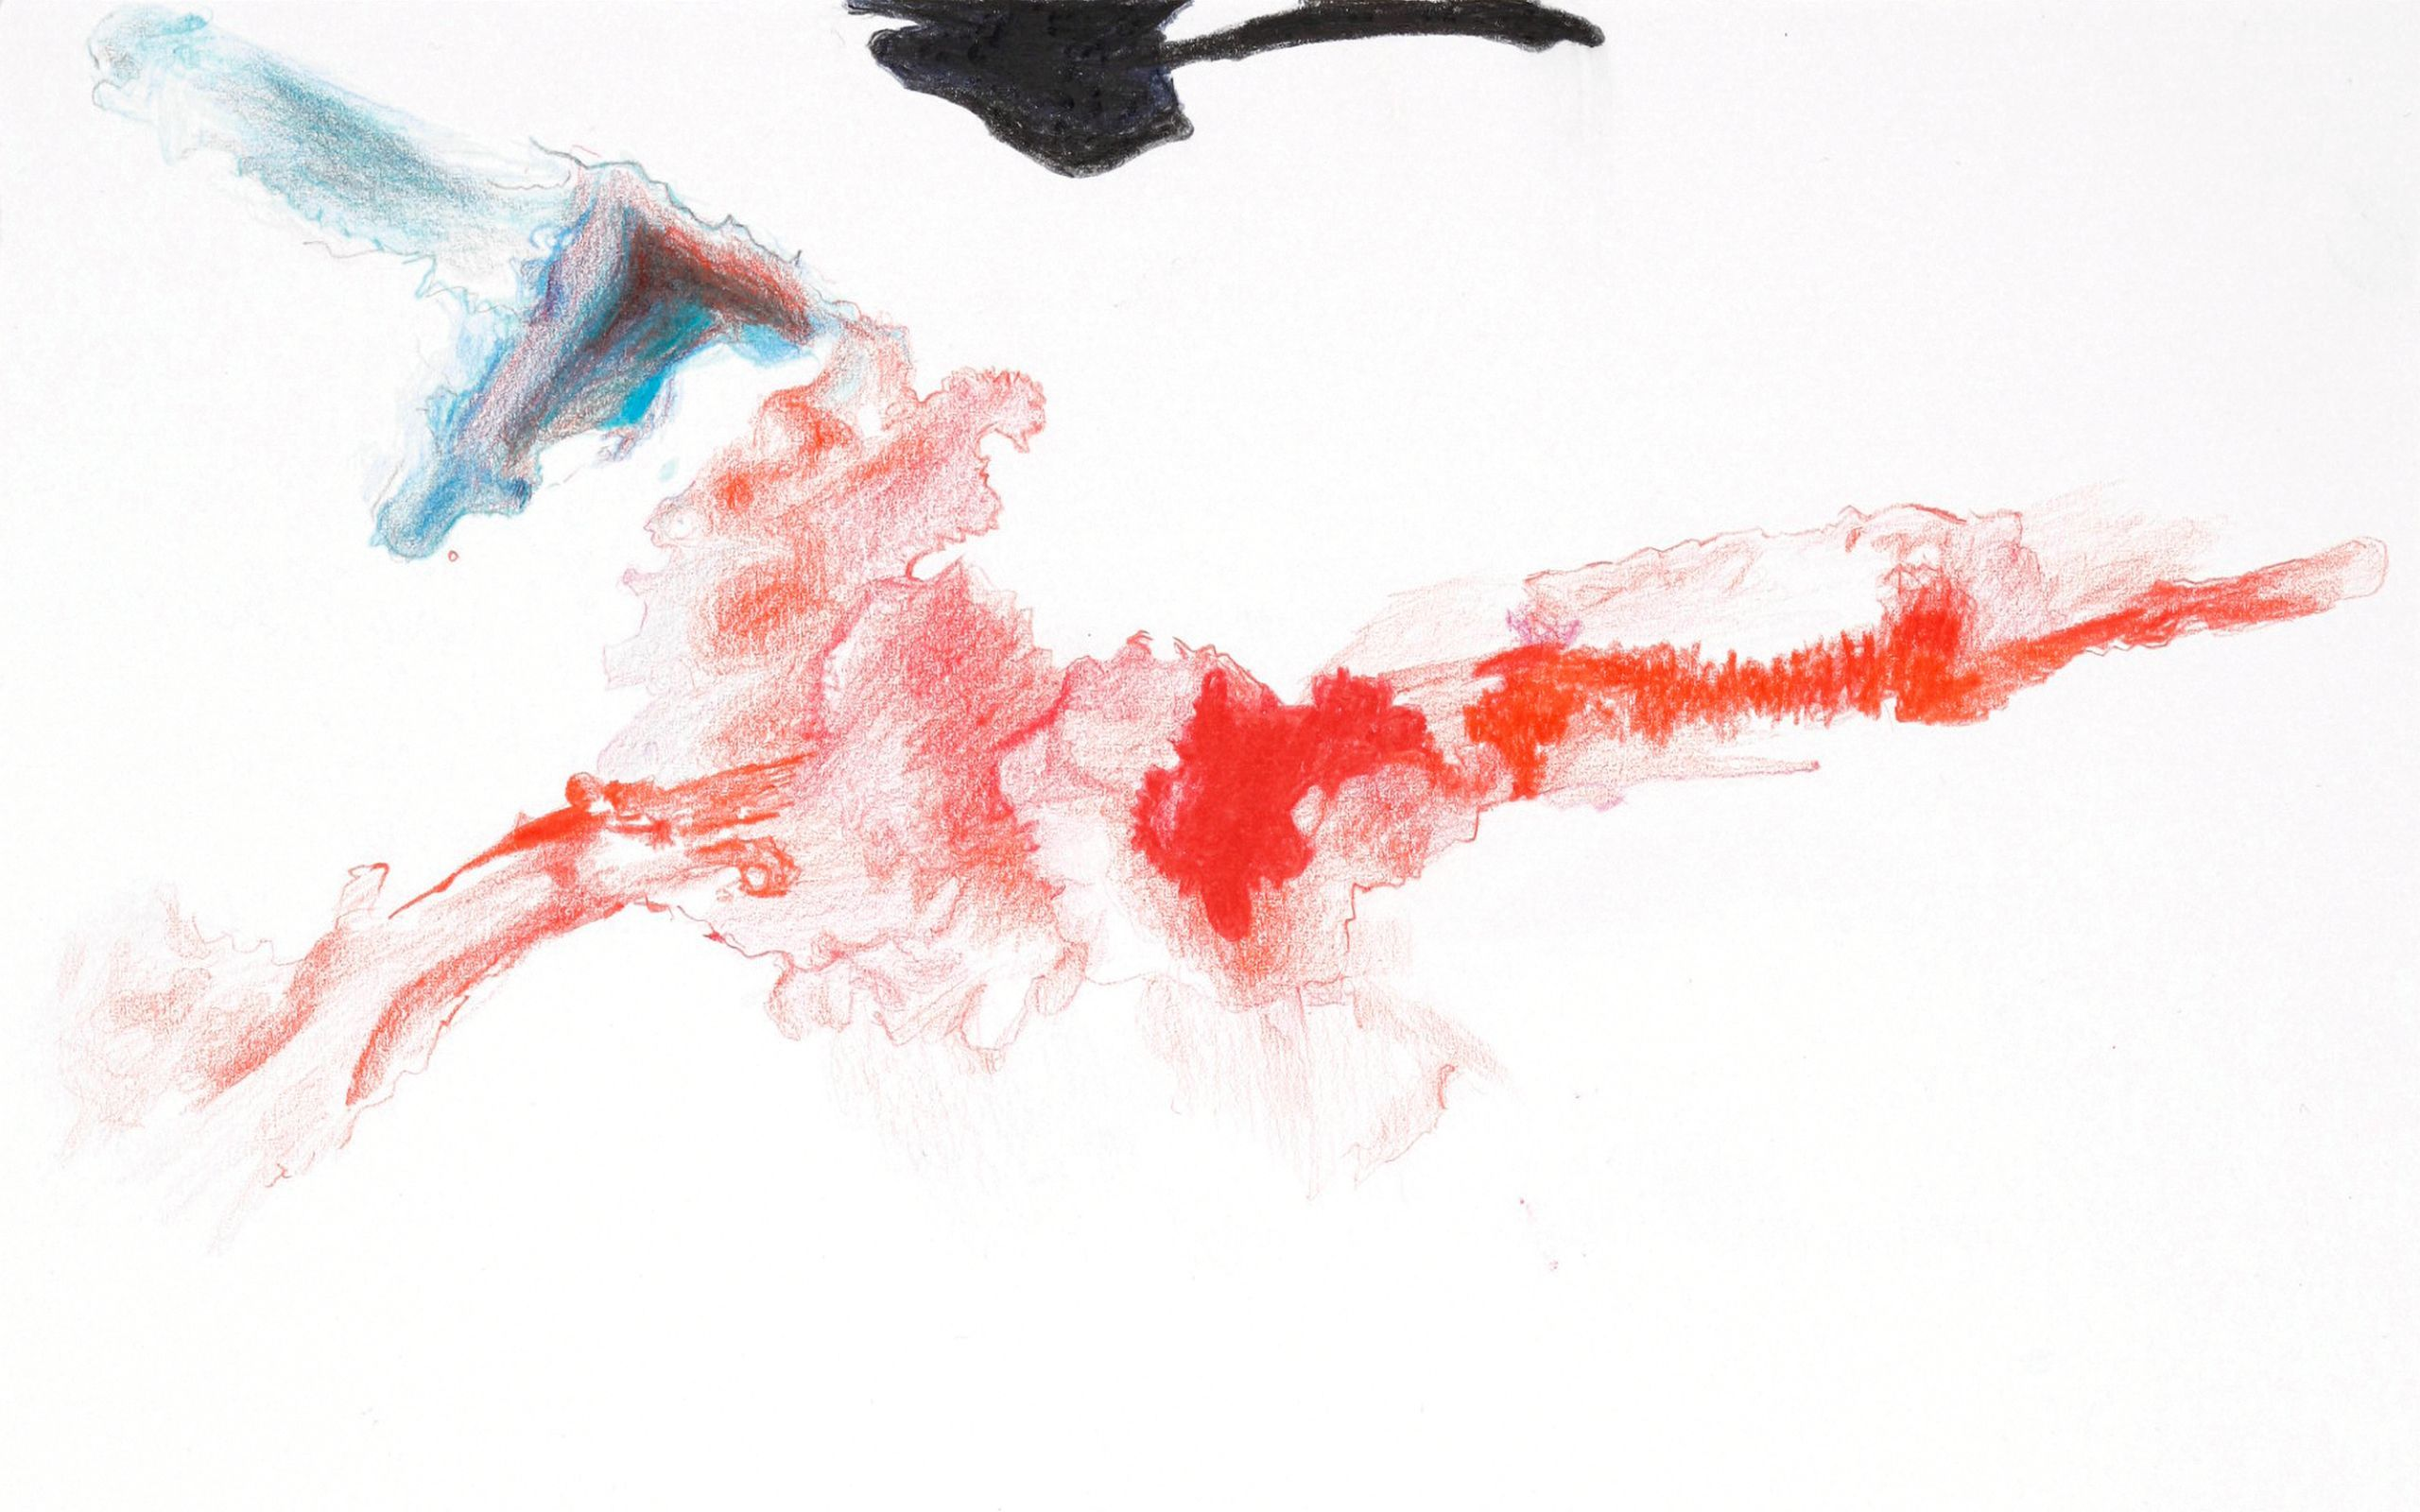 © Barbara Hindahl  © VG Bild-Kunst Bonn, 2020, Fotos: Kathrin Schwab, Mannheim, Bildbearbeitung: Jan Scheffler, Berlin. Cover: Aquarell-Kopie Sea-Life 3, 2019